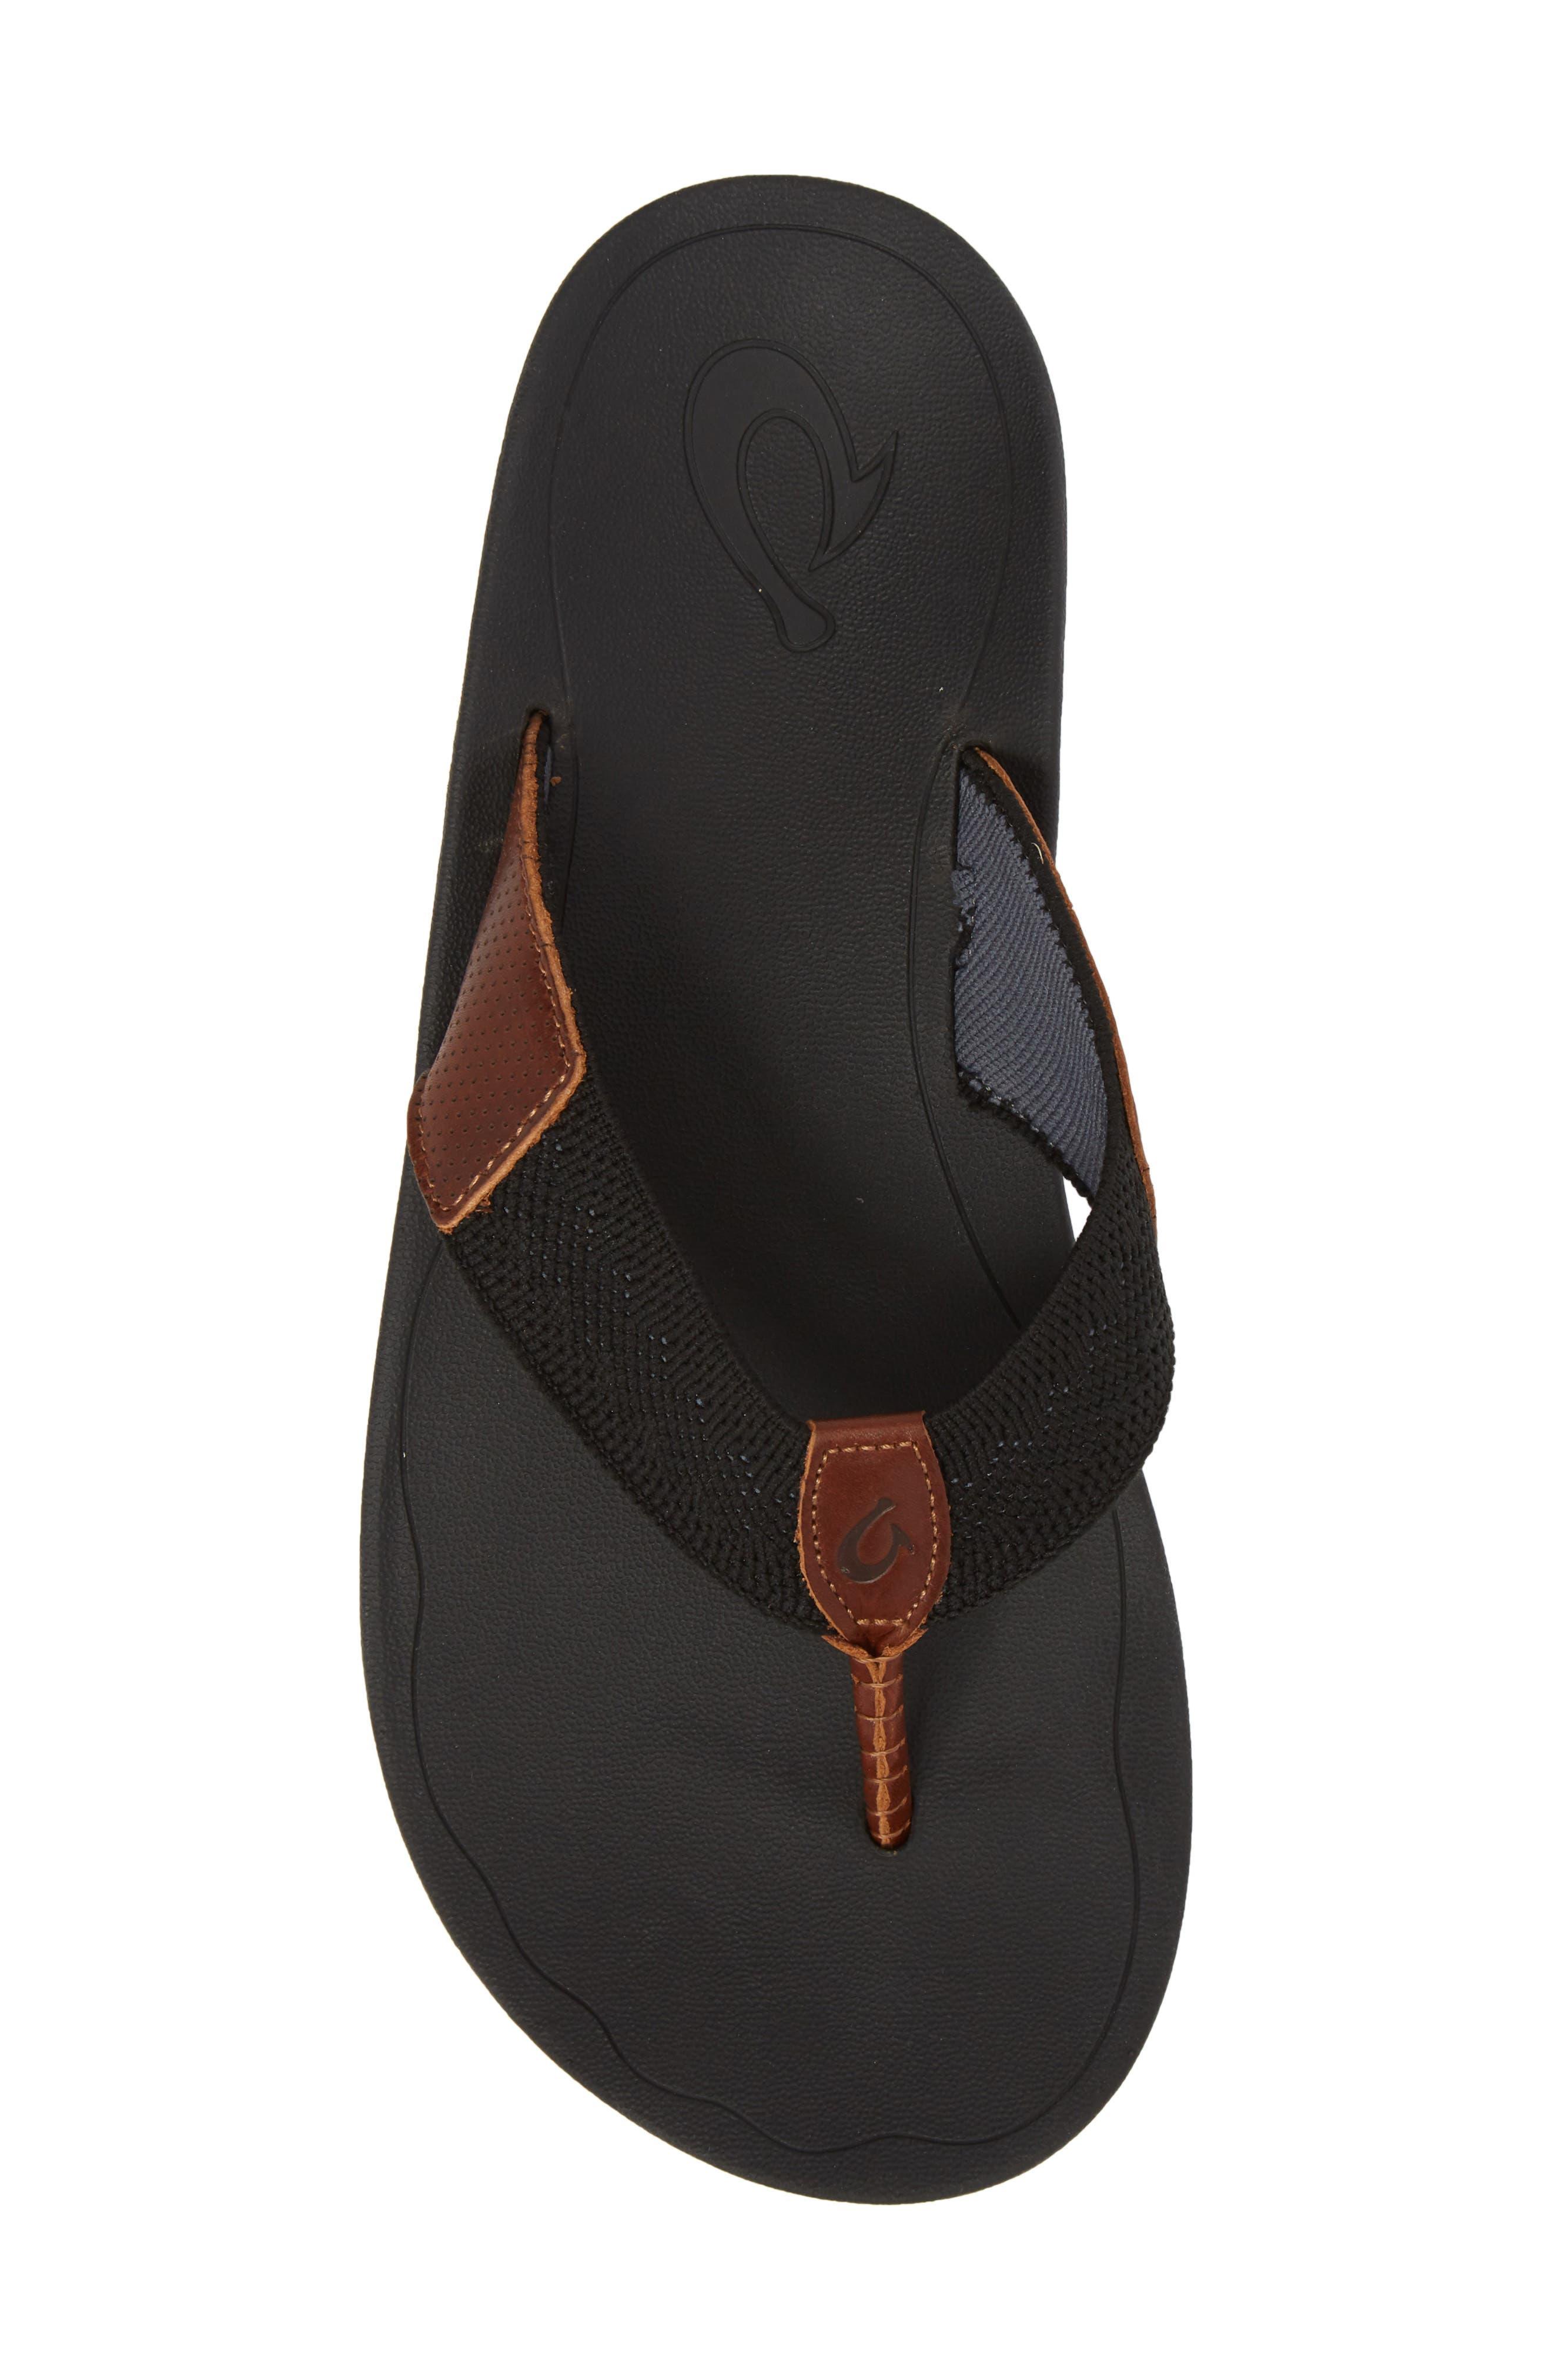 Nohona Ulana Flip Flop,                             Alternate thumbnail 5, color,                             Black/ Black Leather